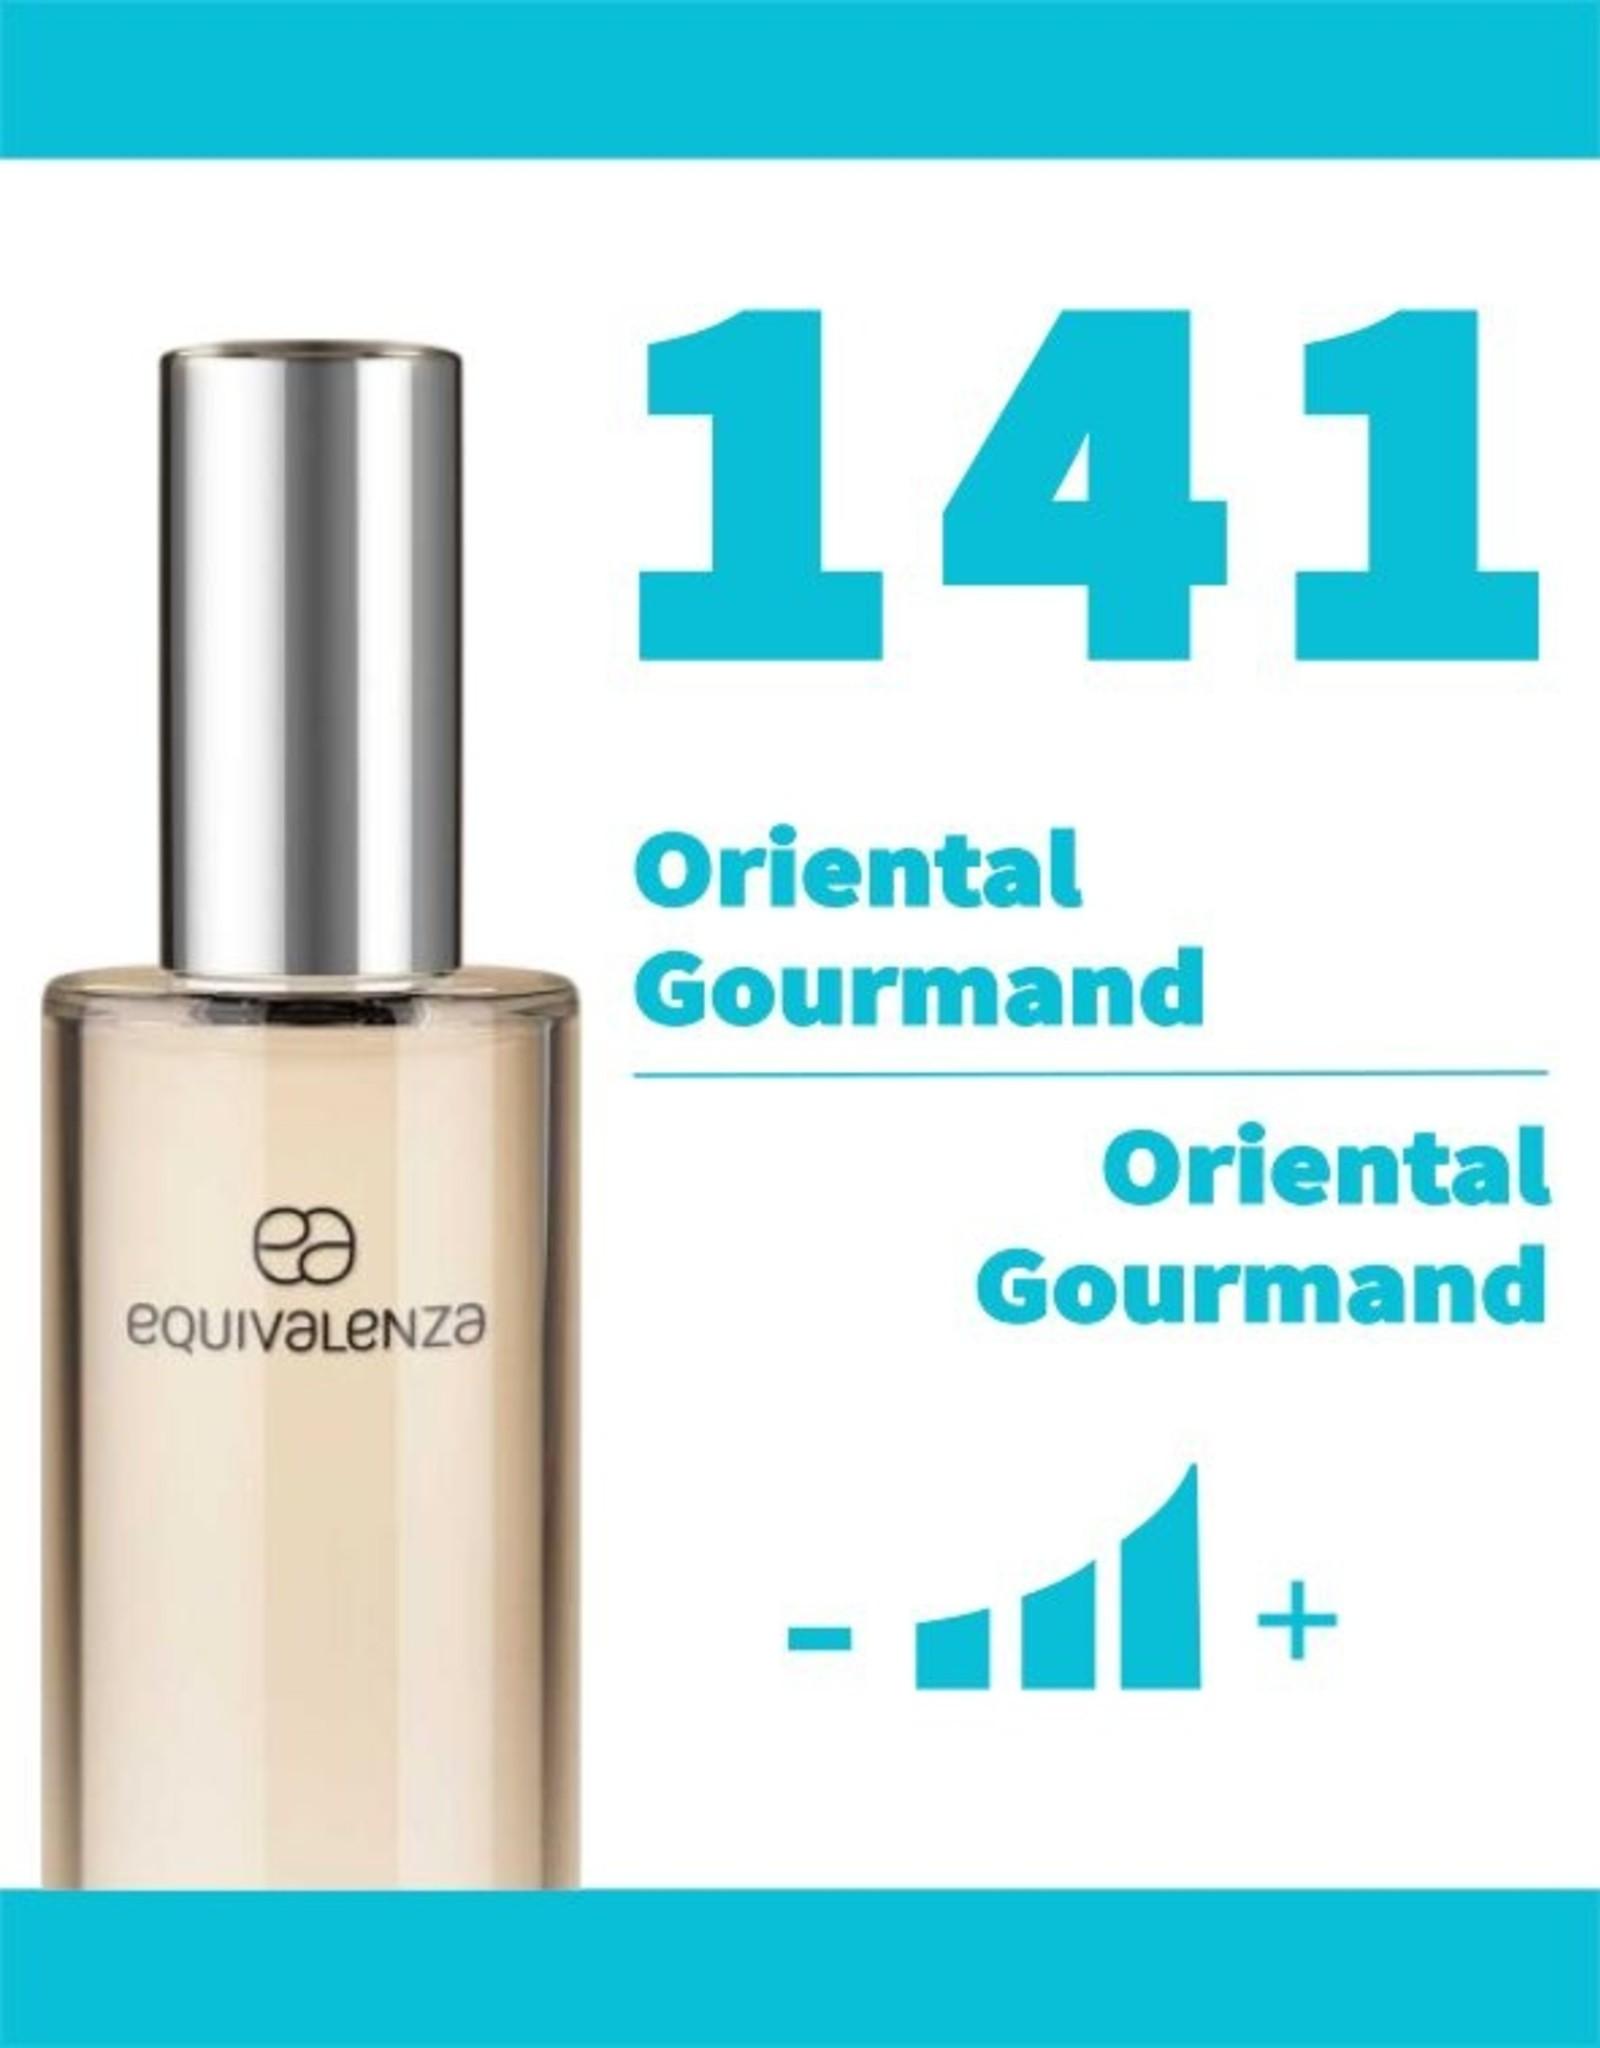 Equivalenza Eau de Parfum Oriental Gourmand 141